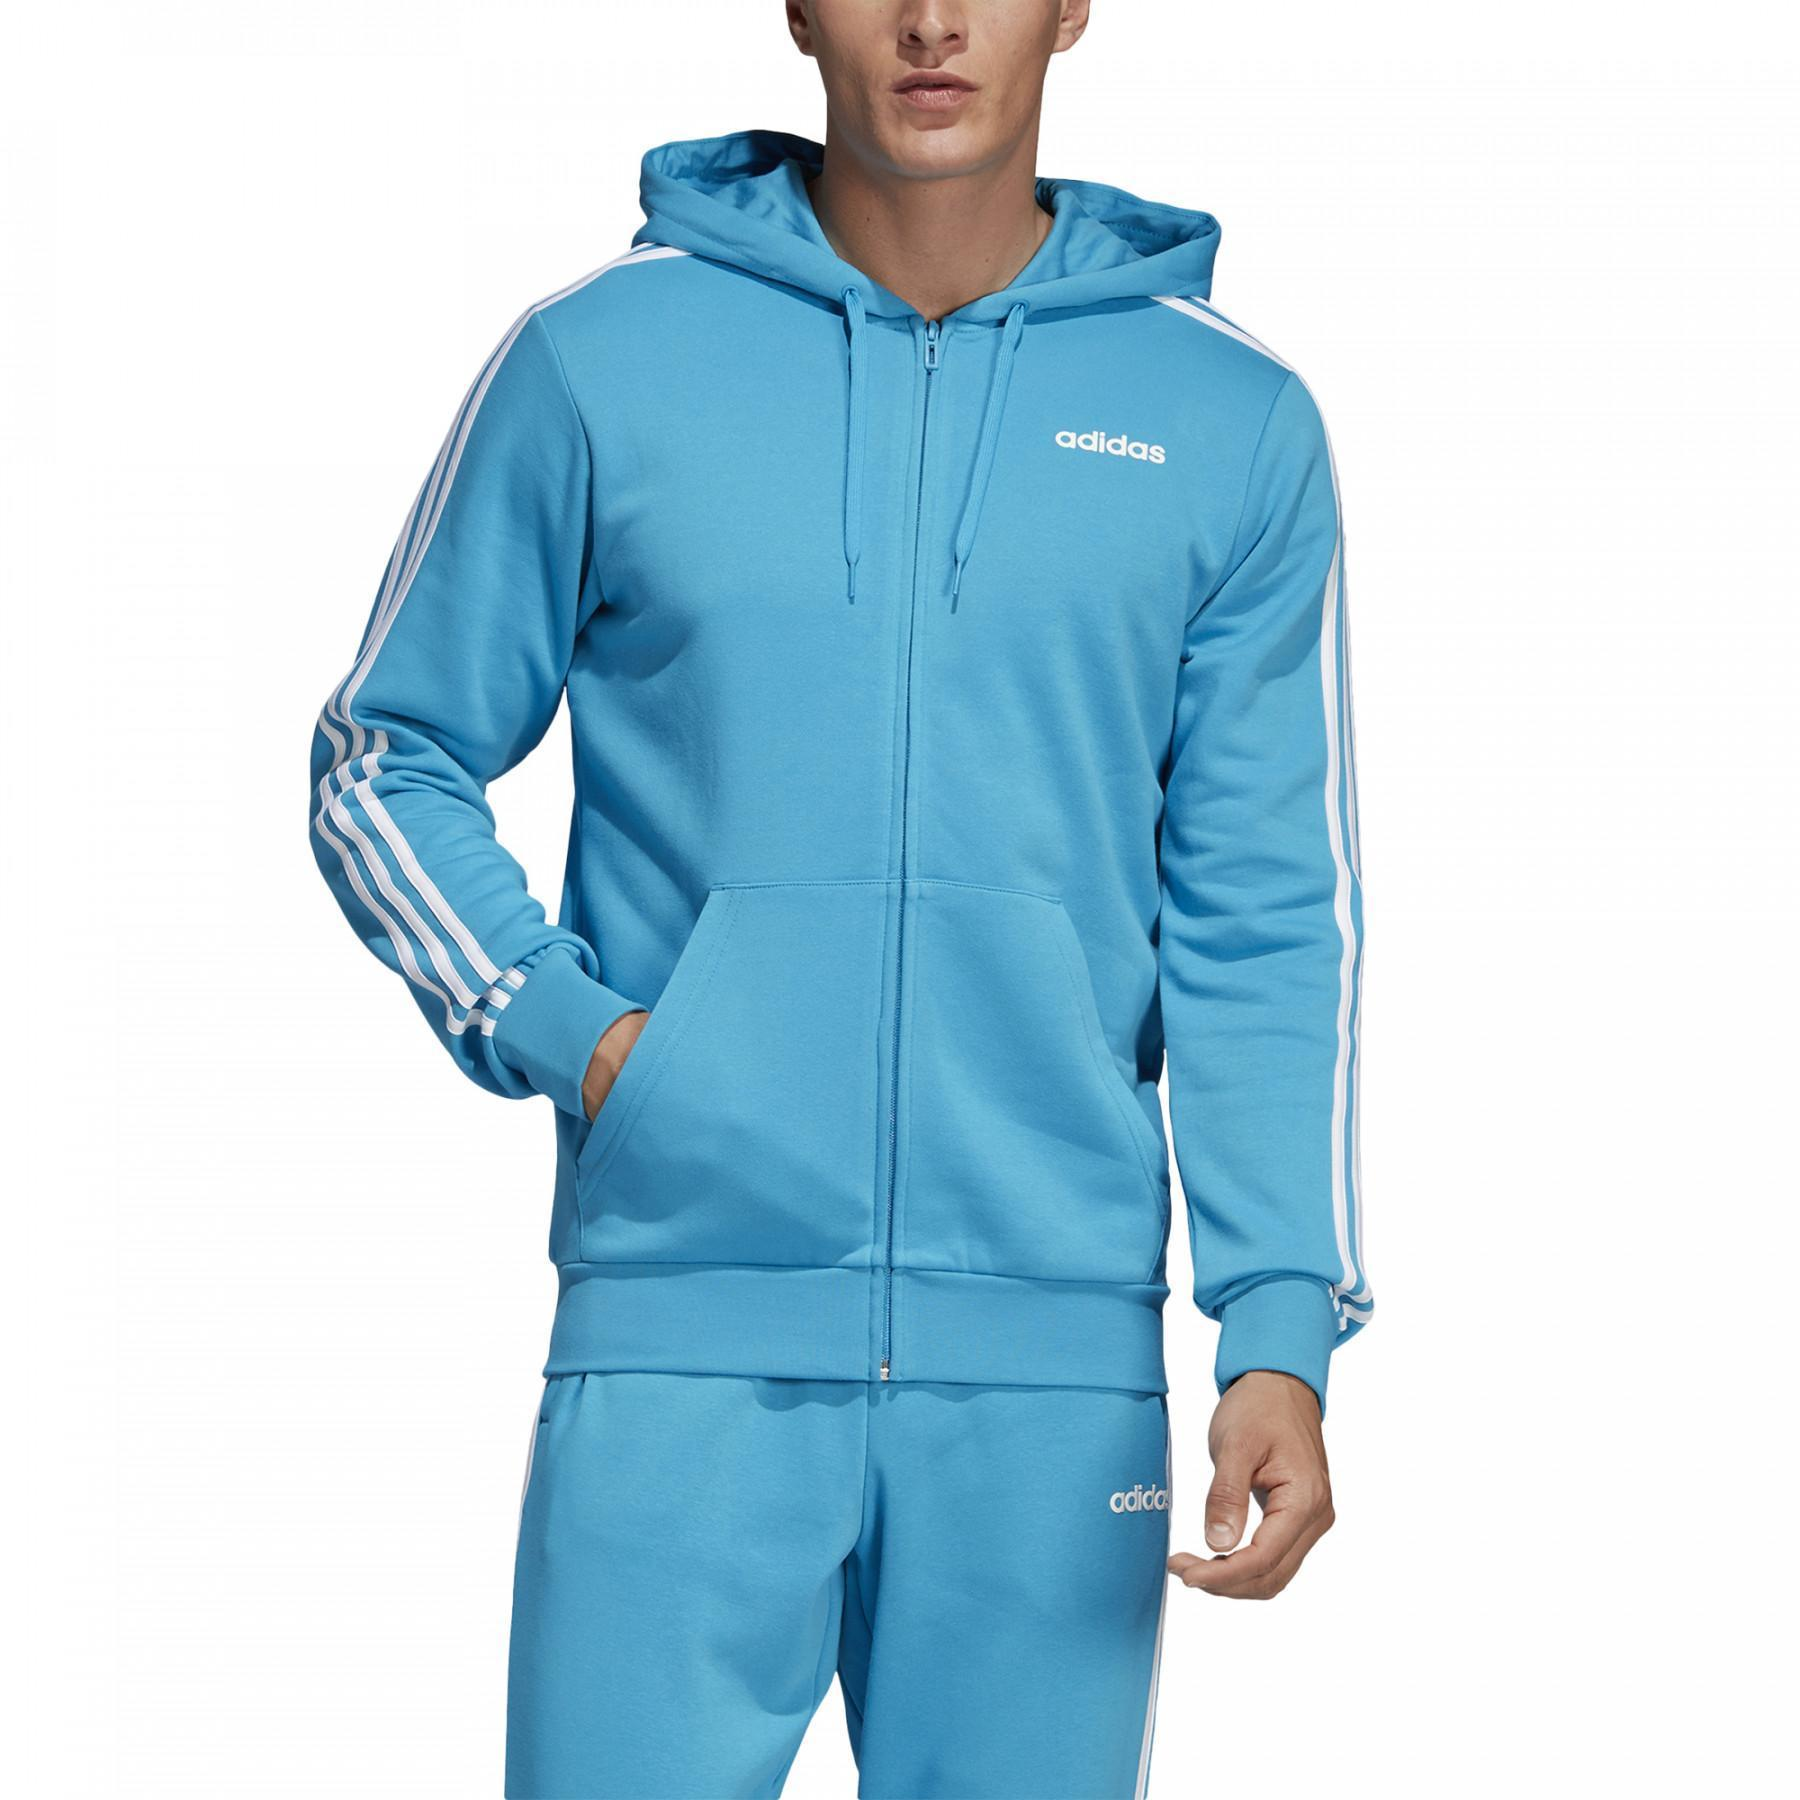 Hooded Jacket adidas Essentials 3-Stripes Fleece